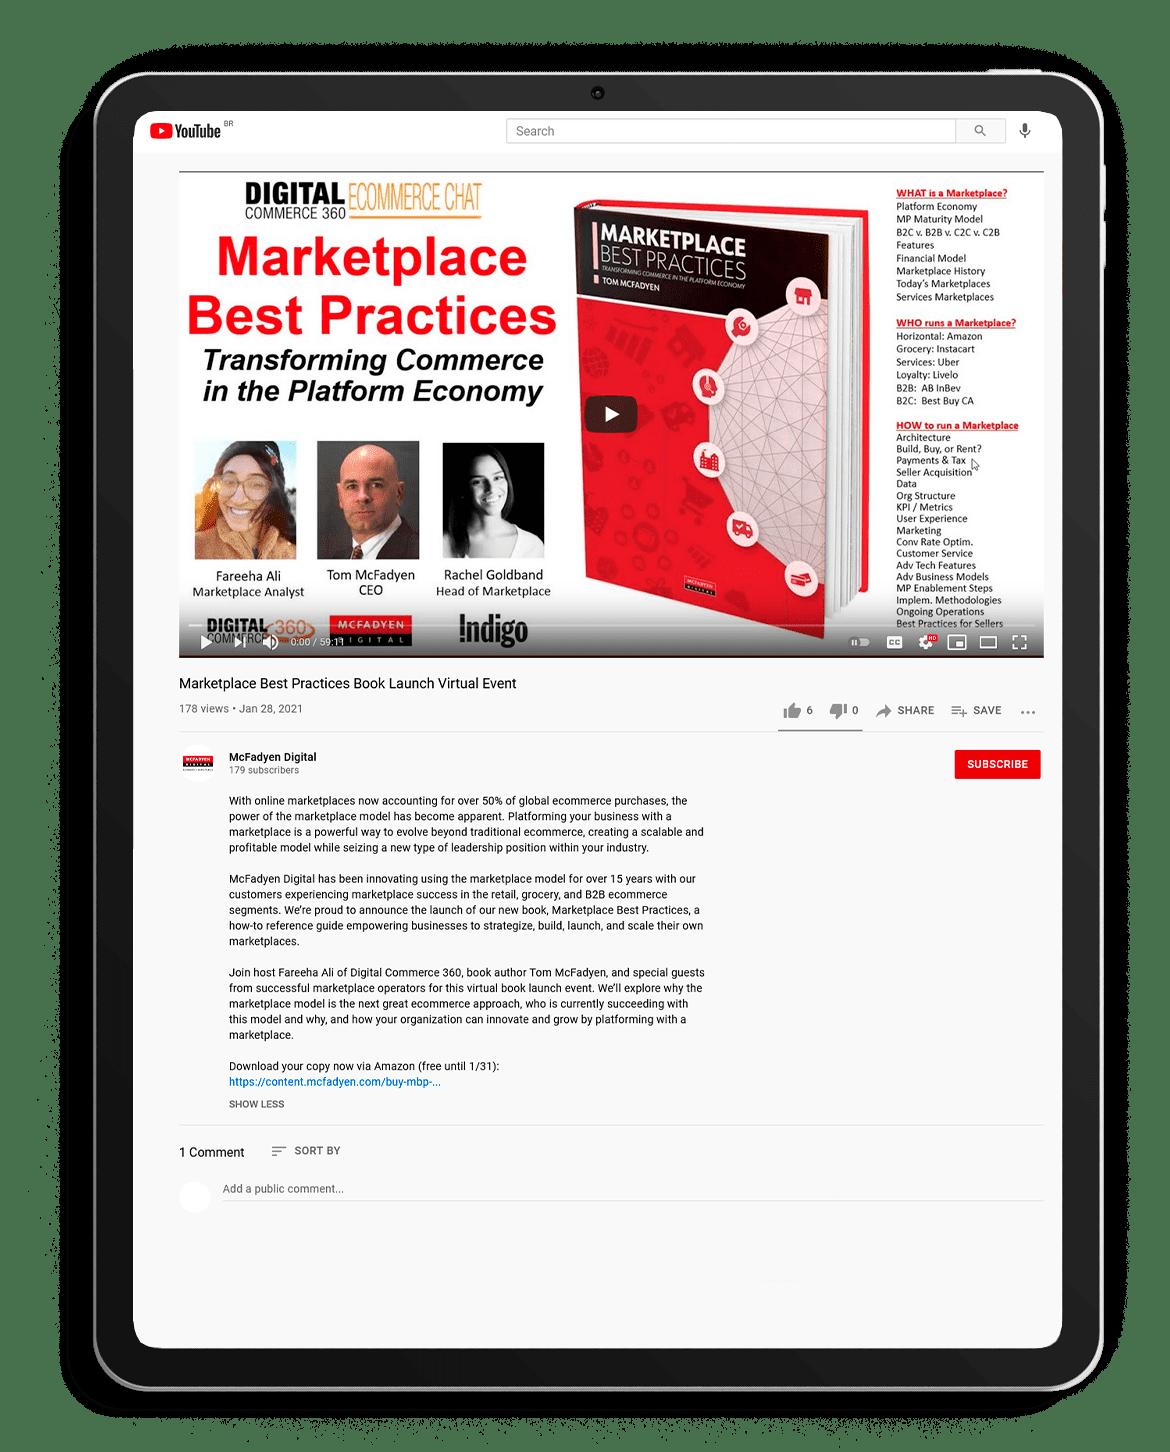 Marketplace Best Practices Book Launch Event